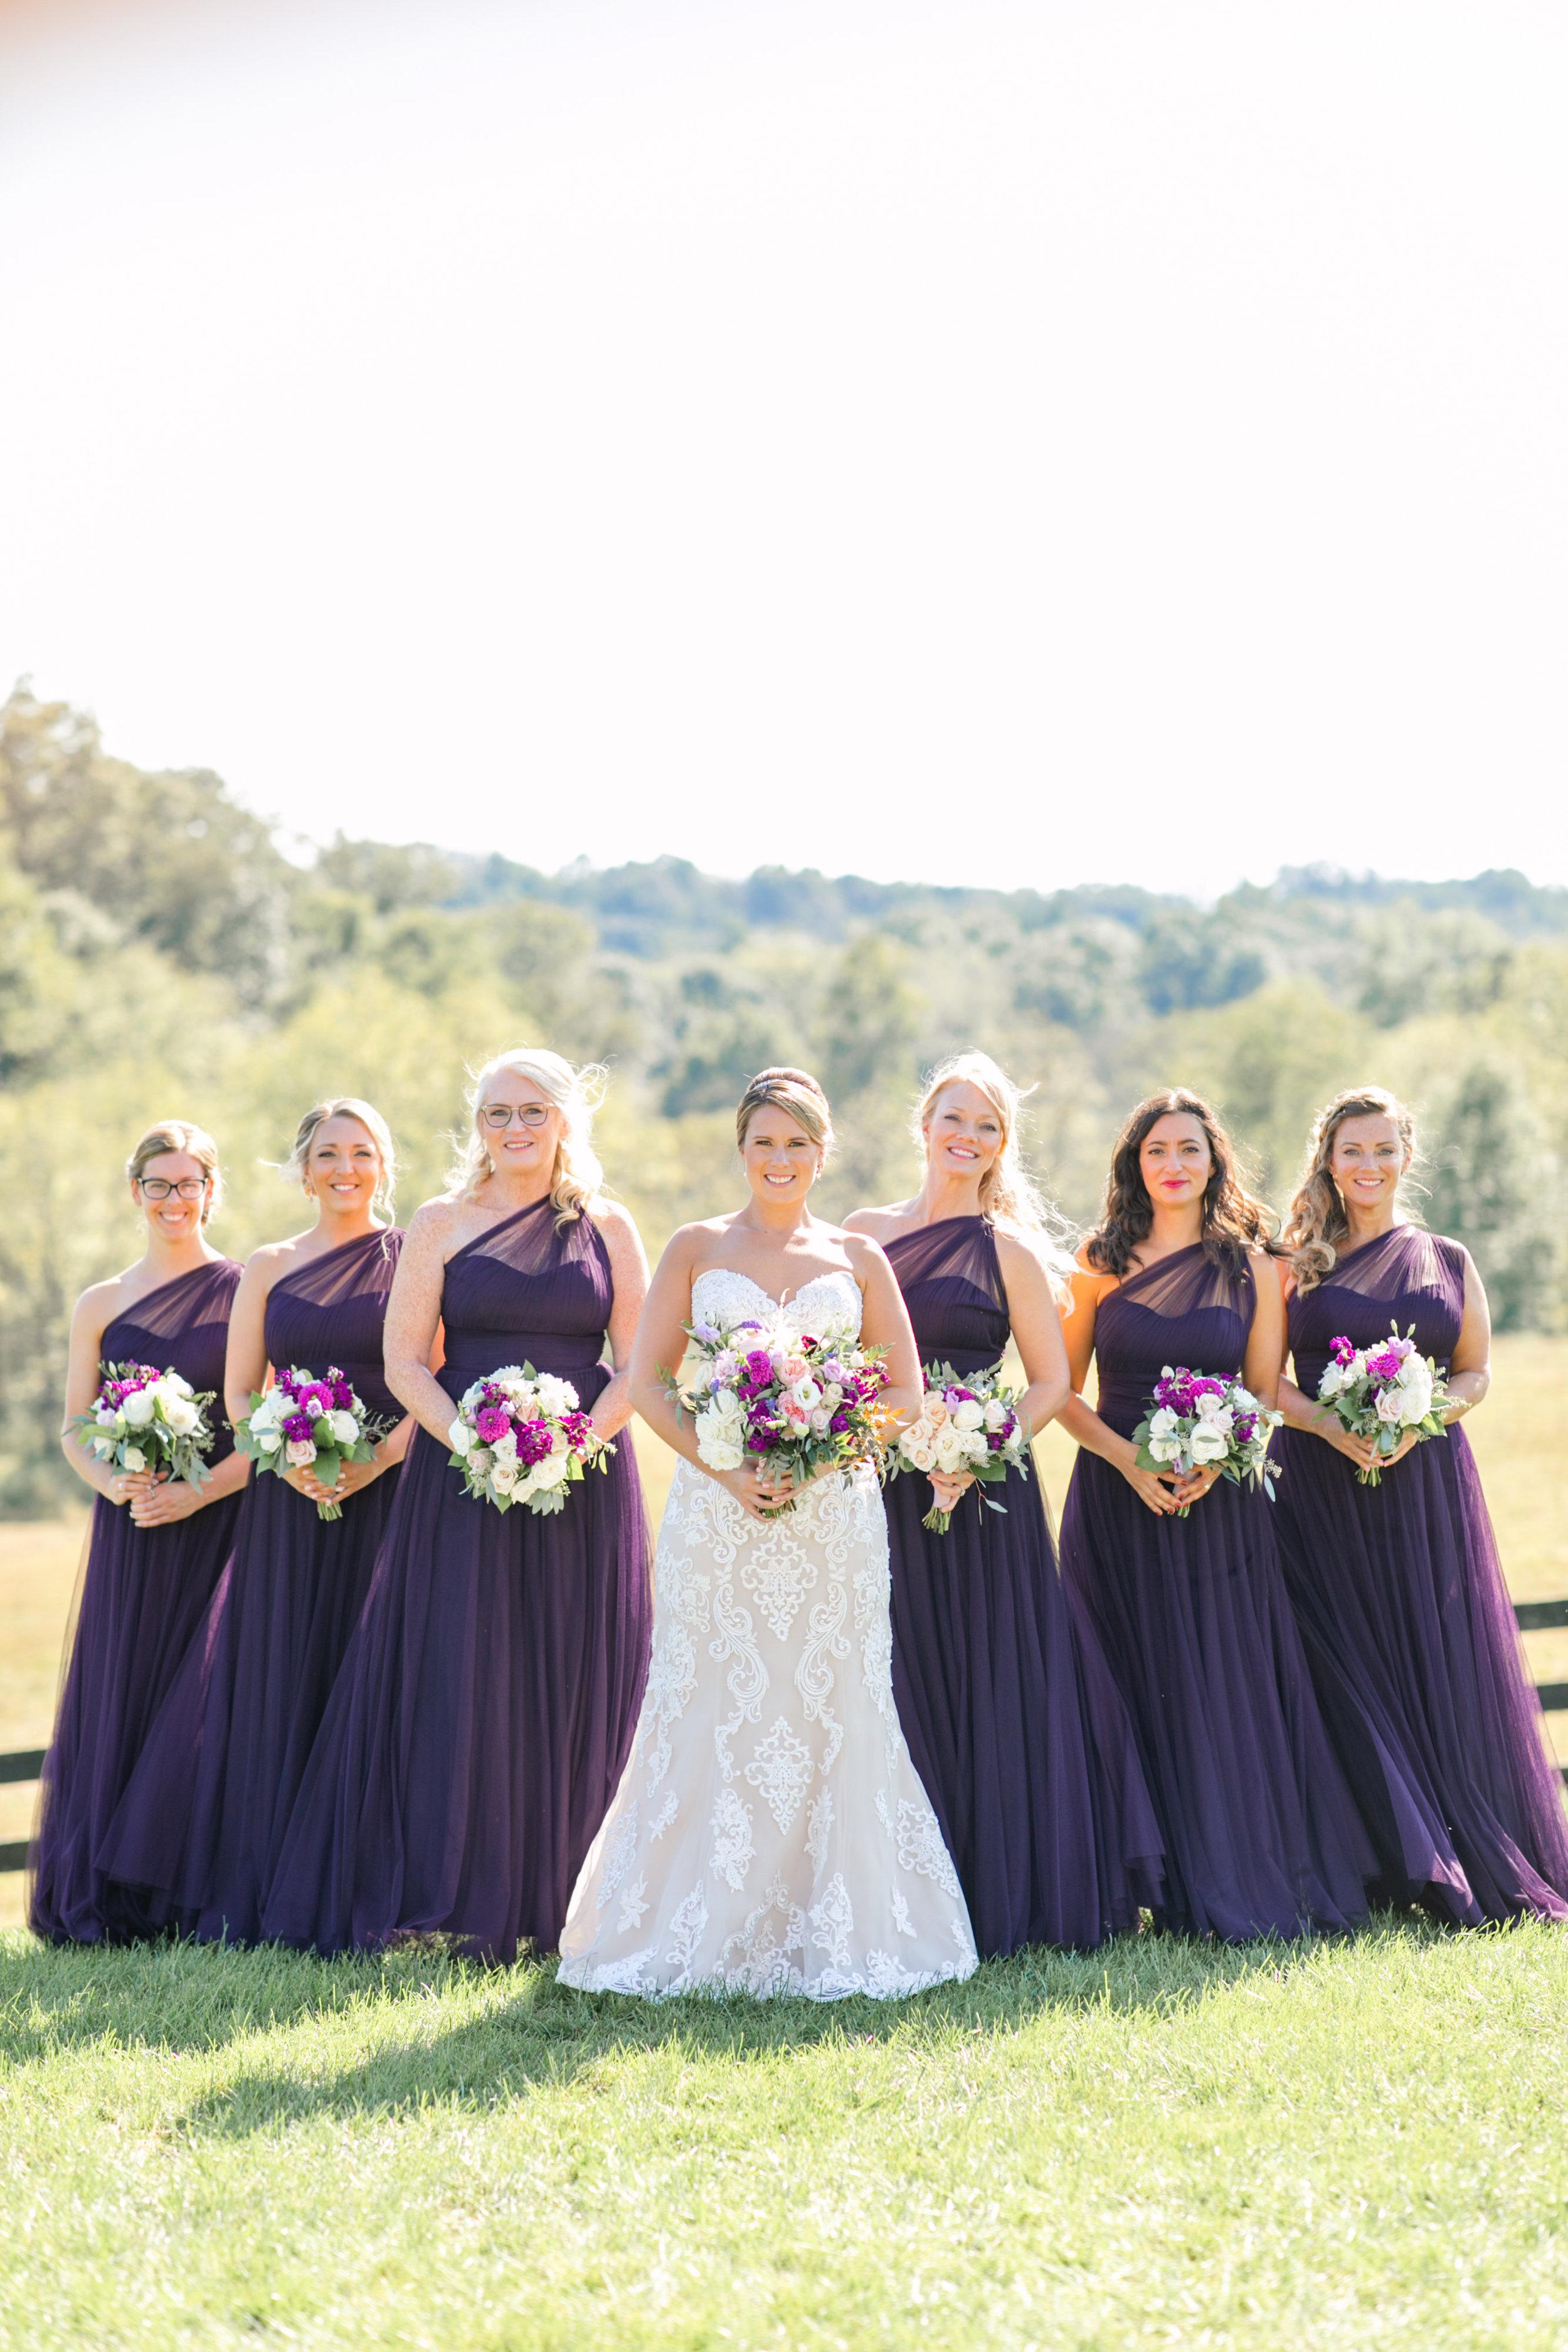 093018 VA Samantha Sihelnick + Russell - Megan Kelsey Photography LWi EP-0003 (IGSHARE).jpg